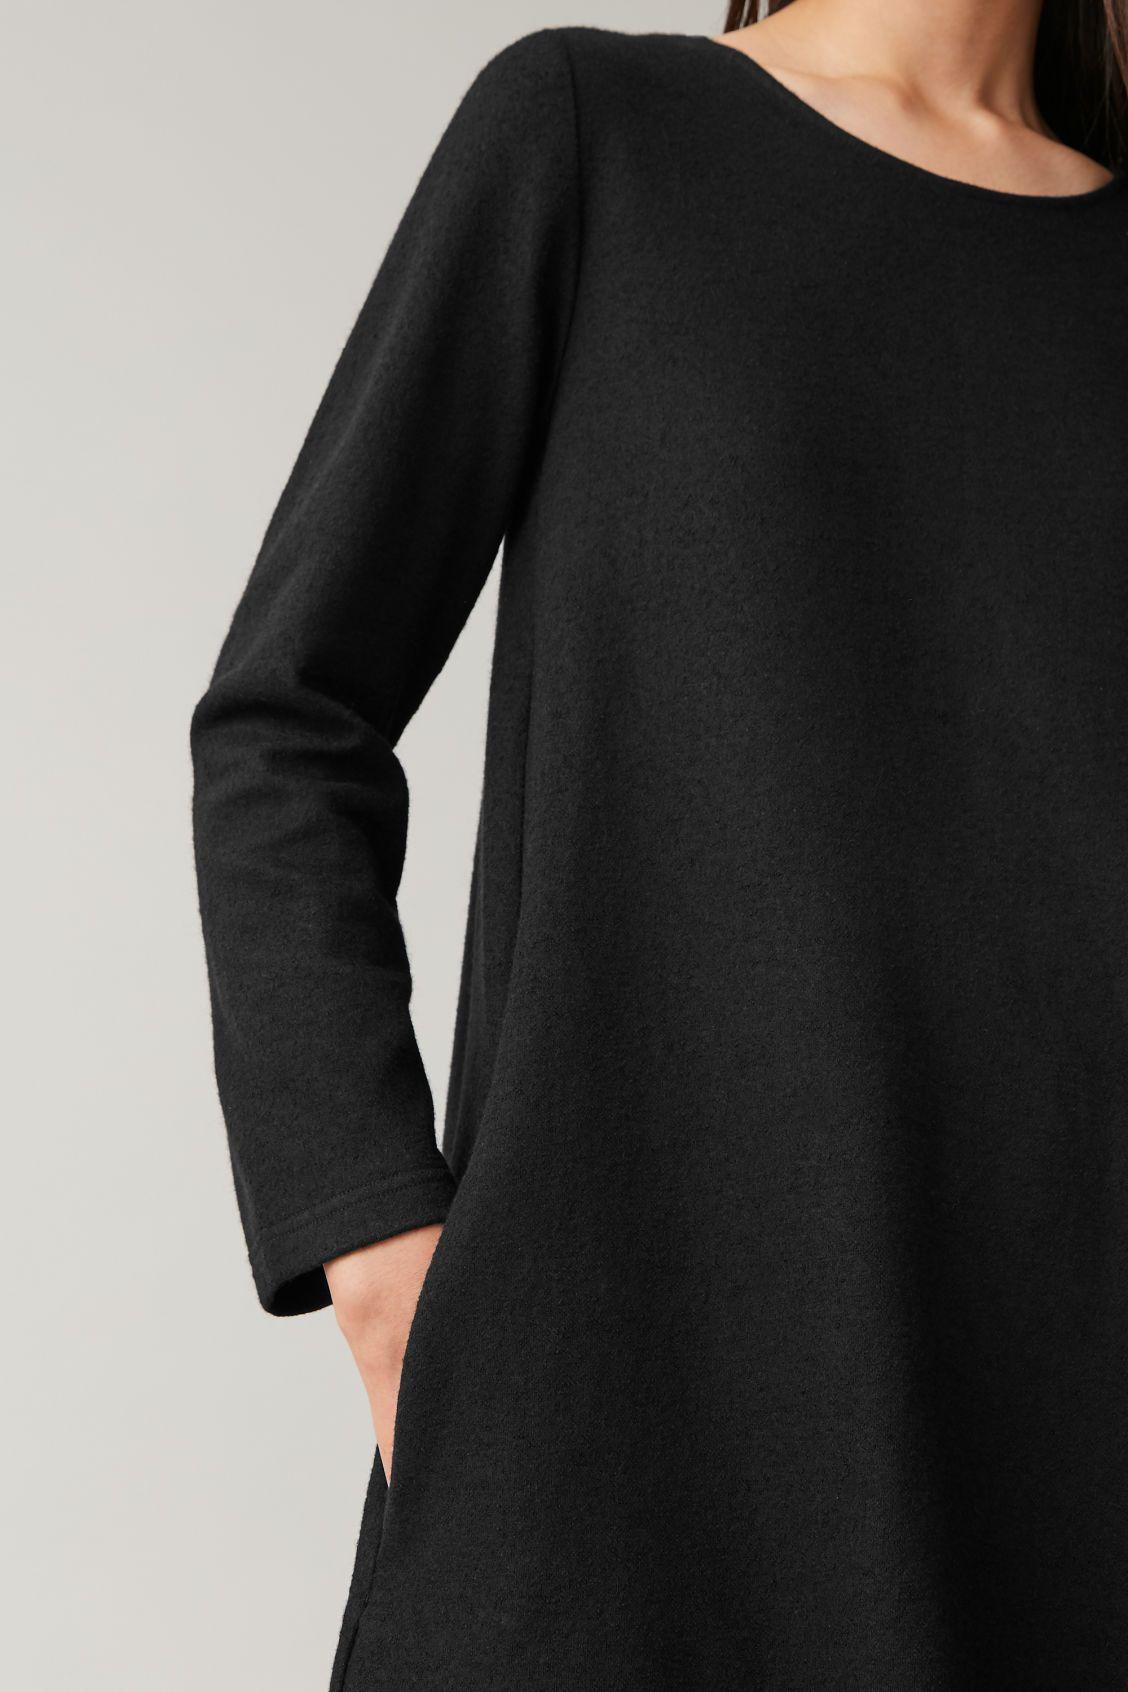 18+ Kleid Schwarz Cos Beatifull - Givil Lardo